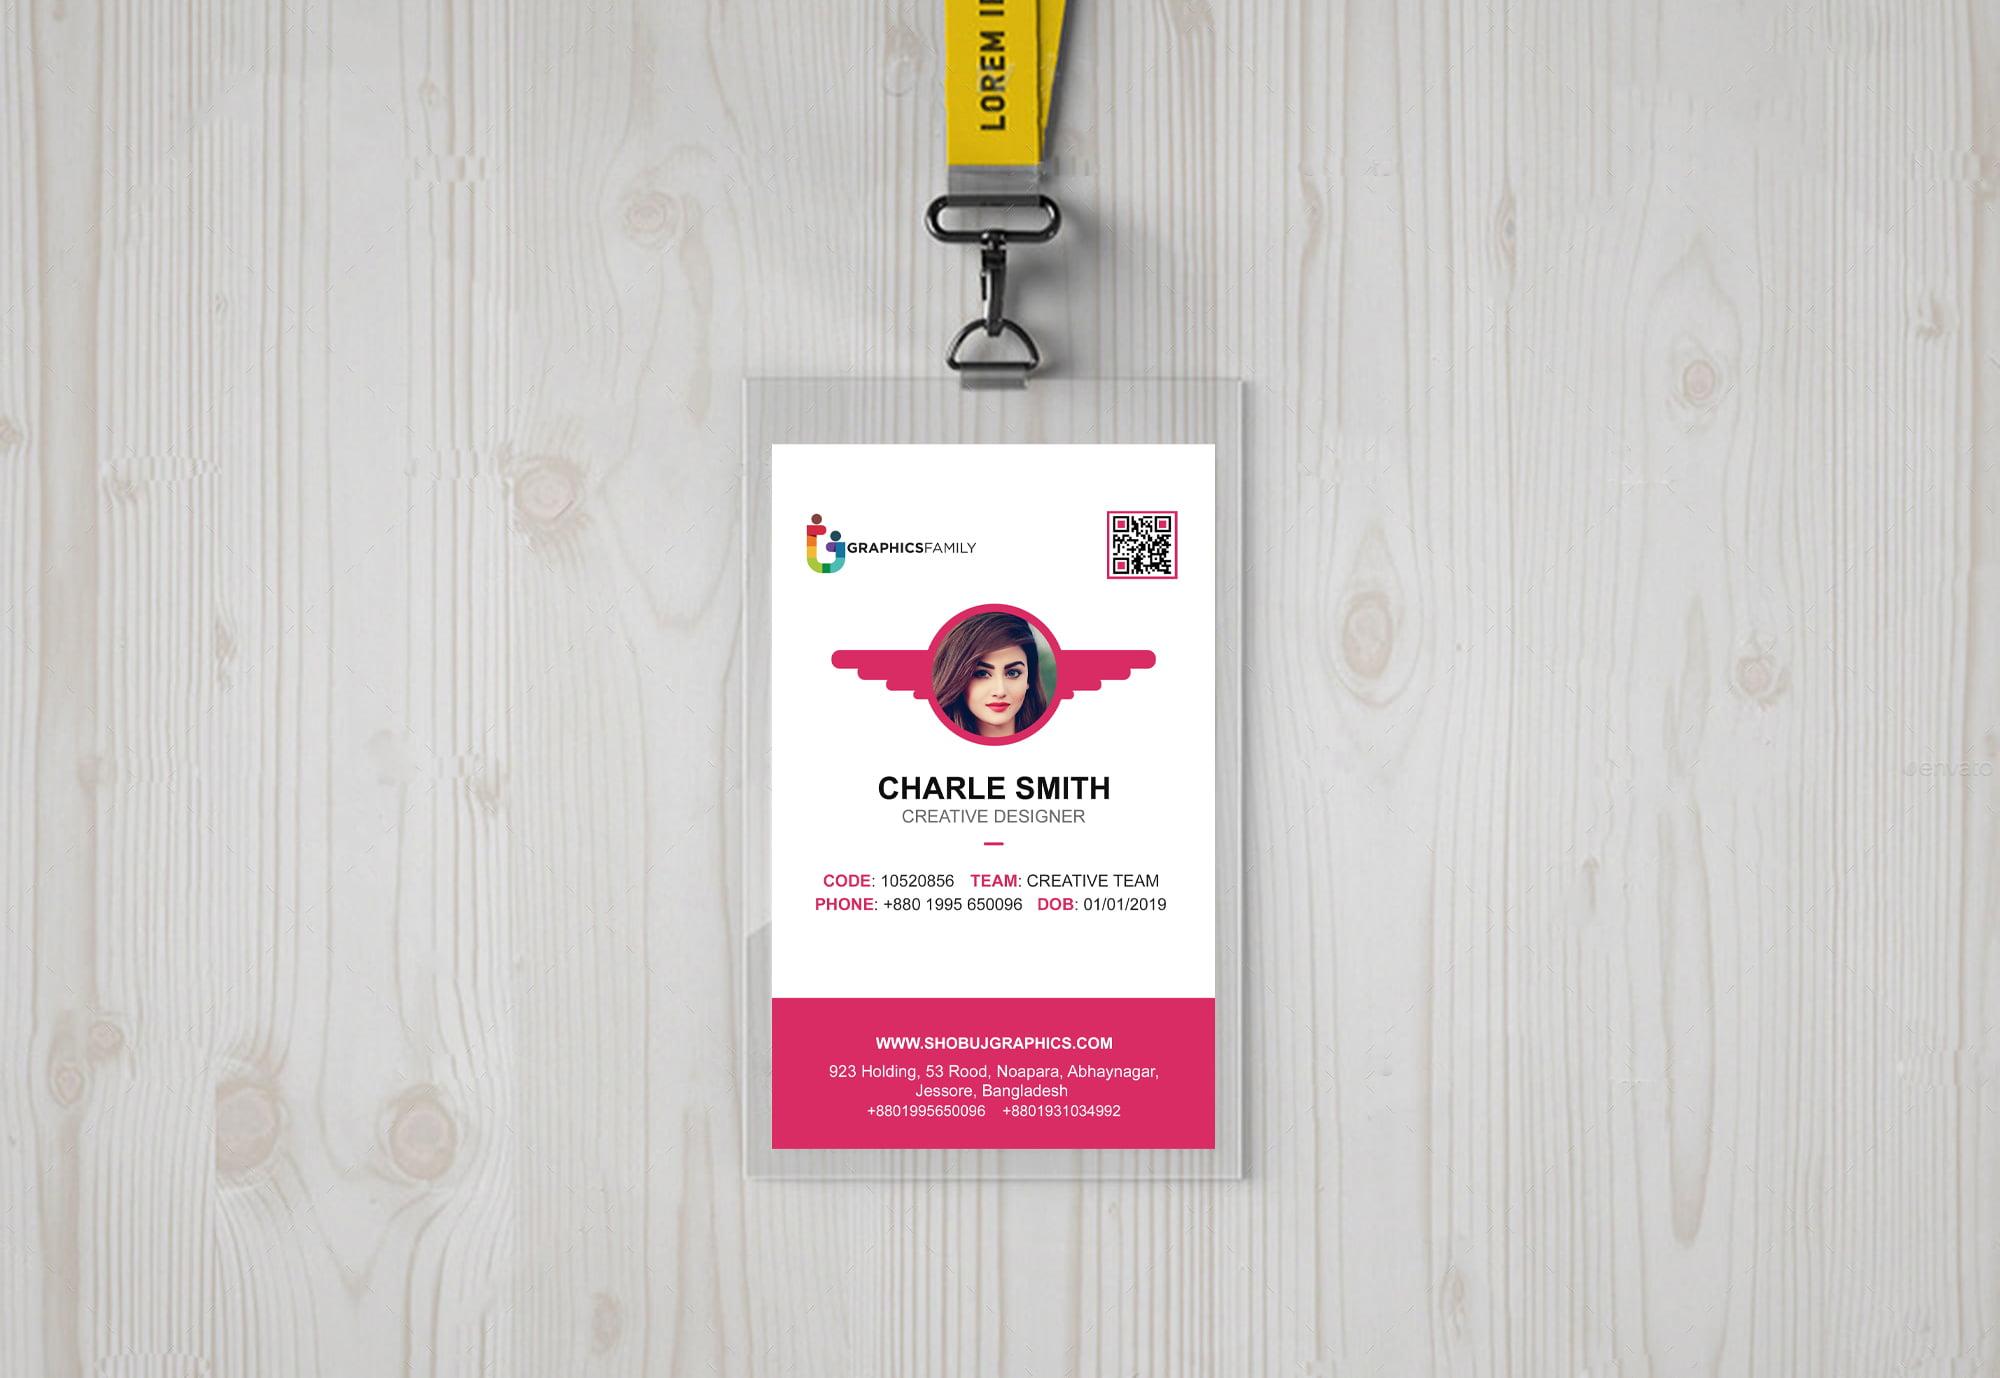 Id-card design free template